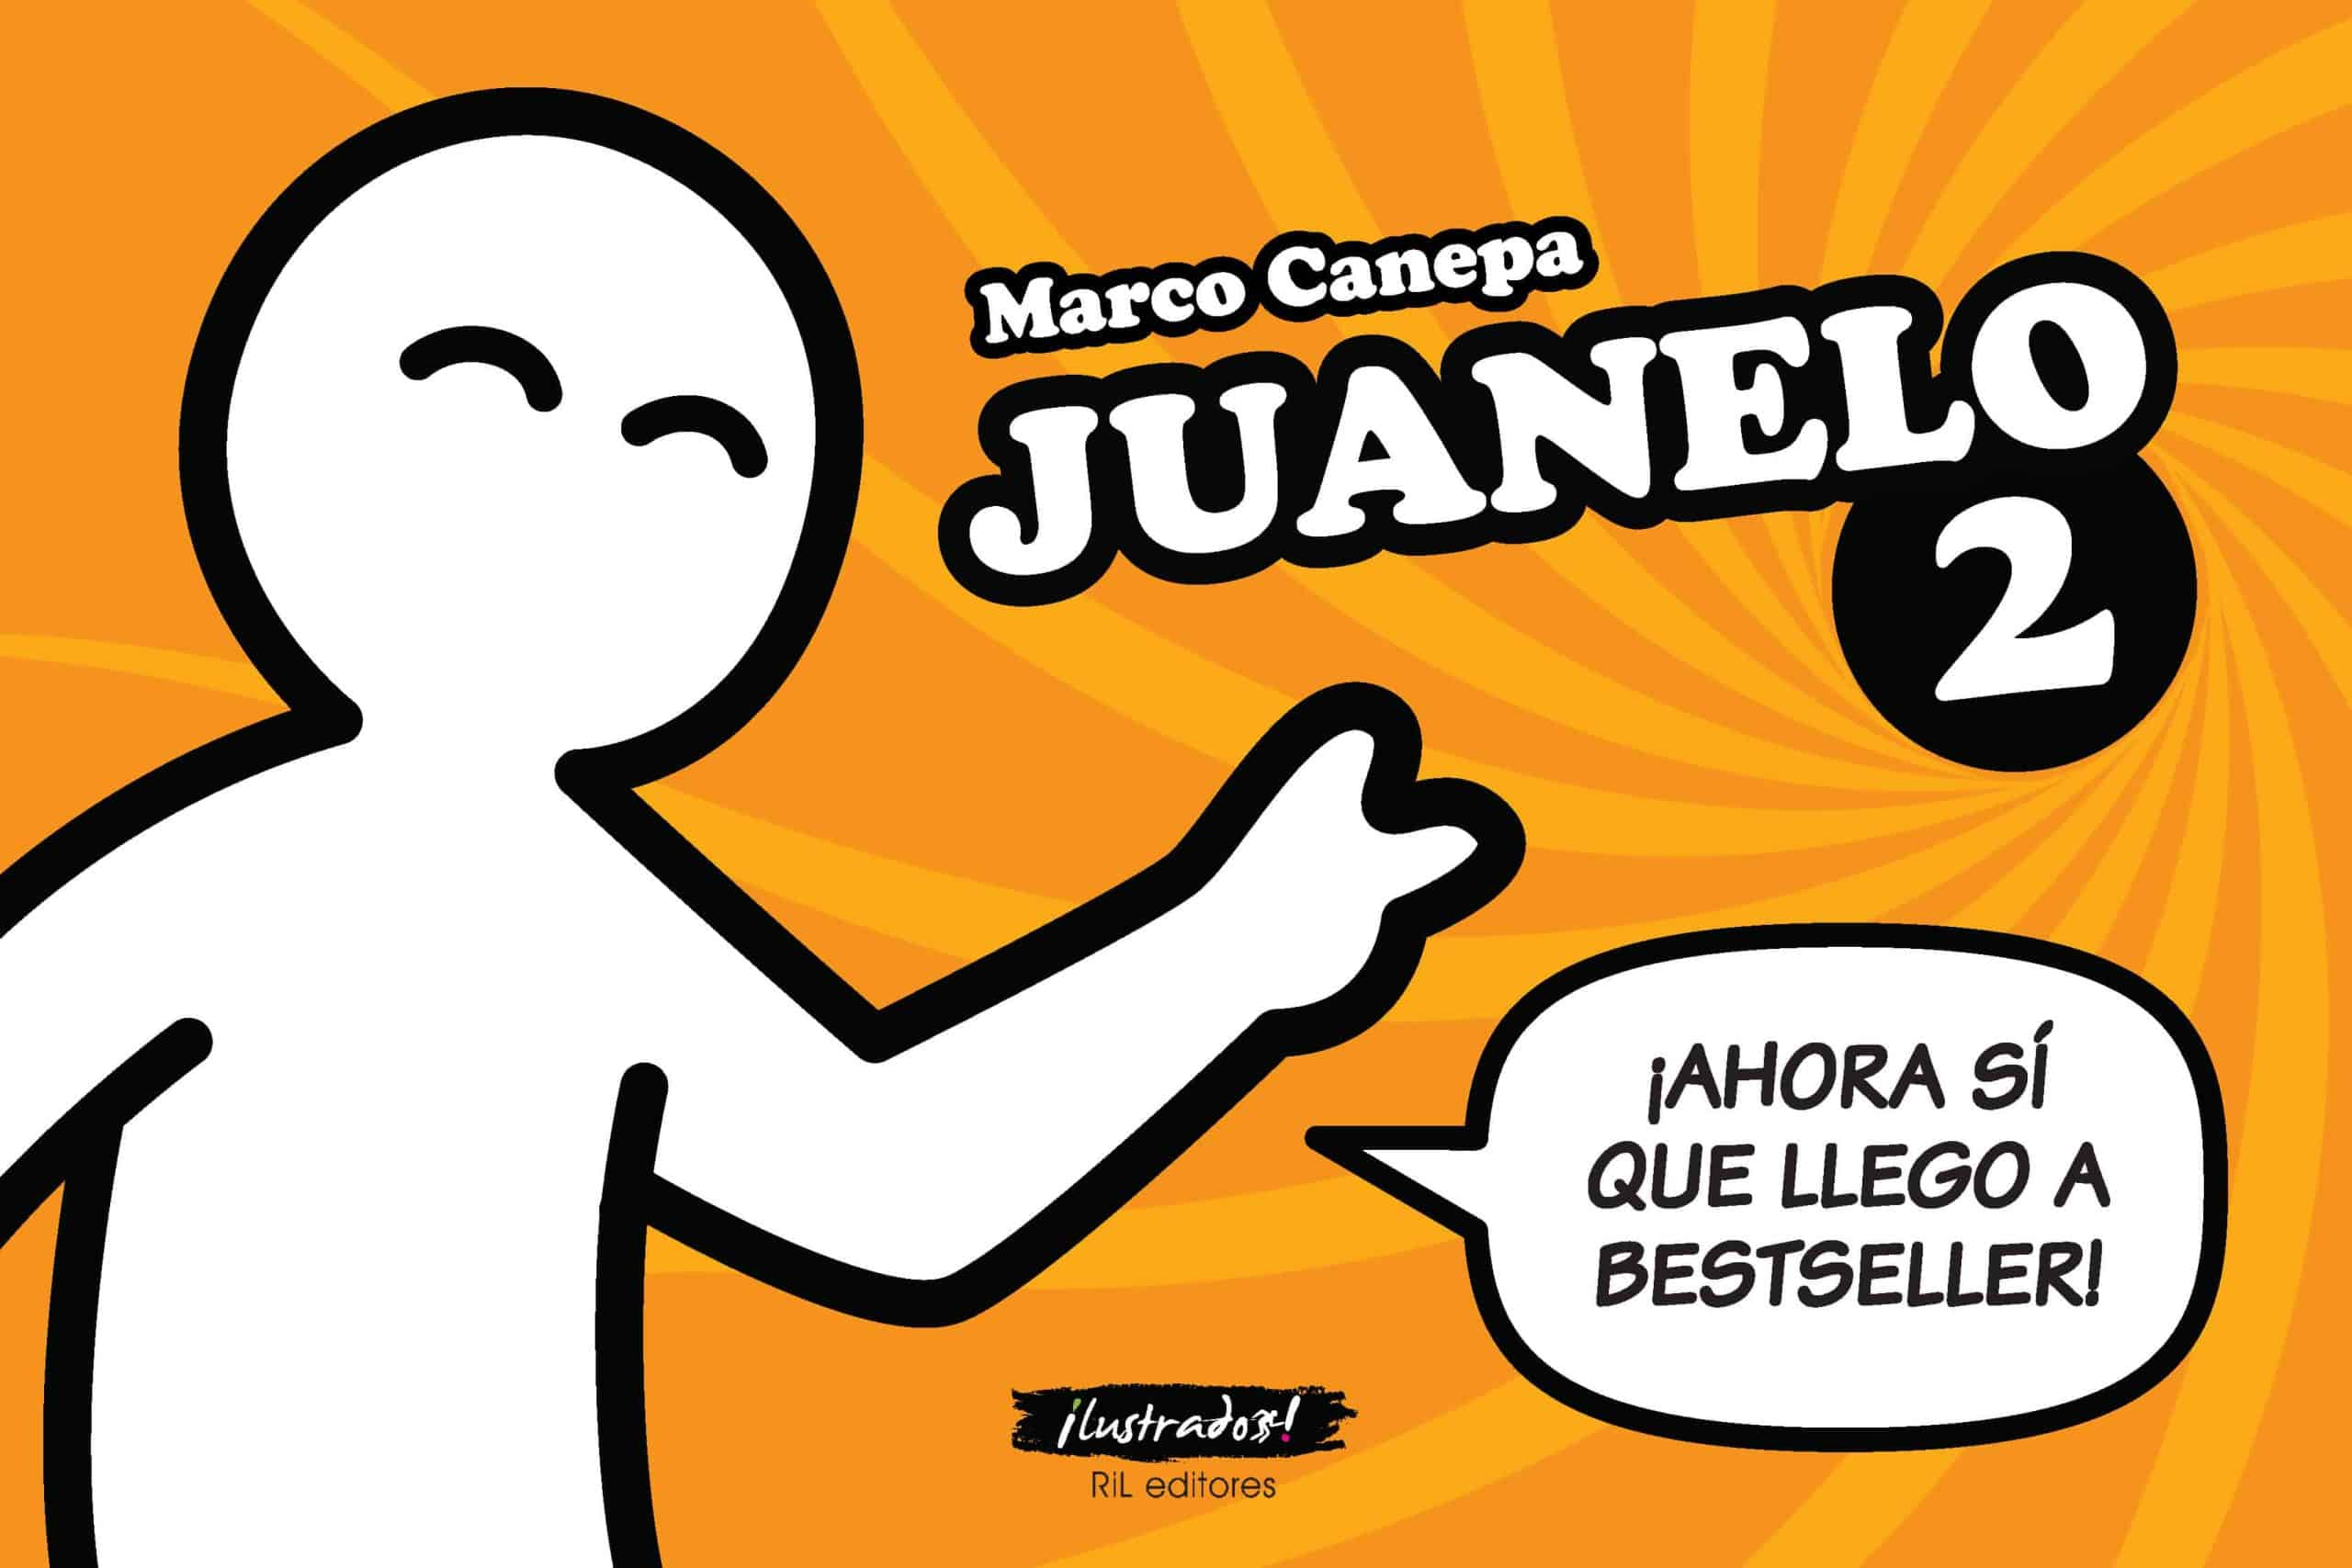 Juanelo 2 1